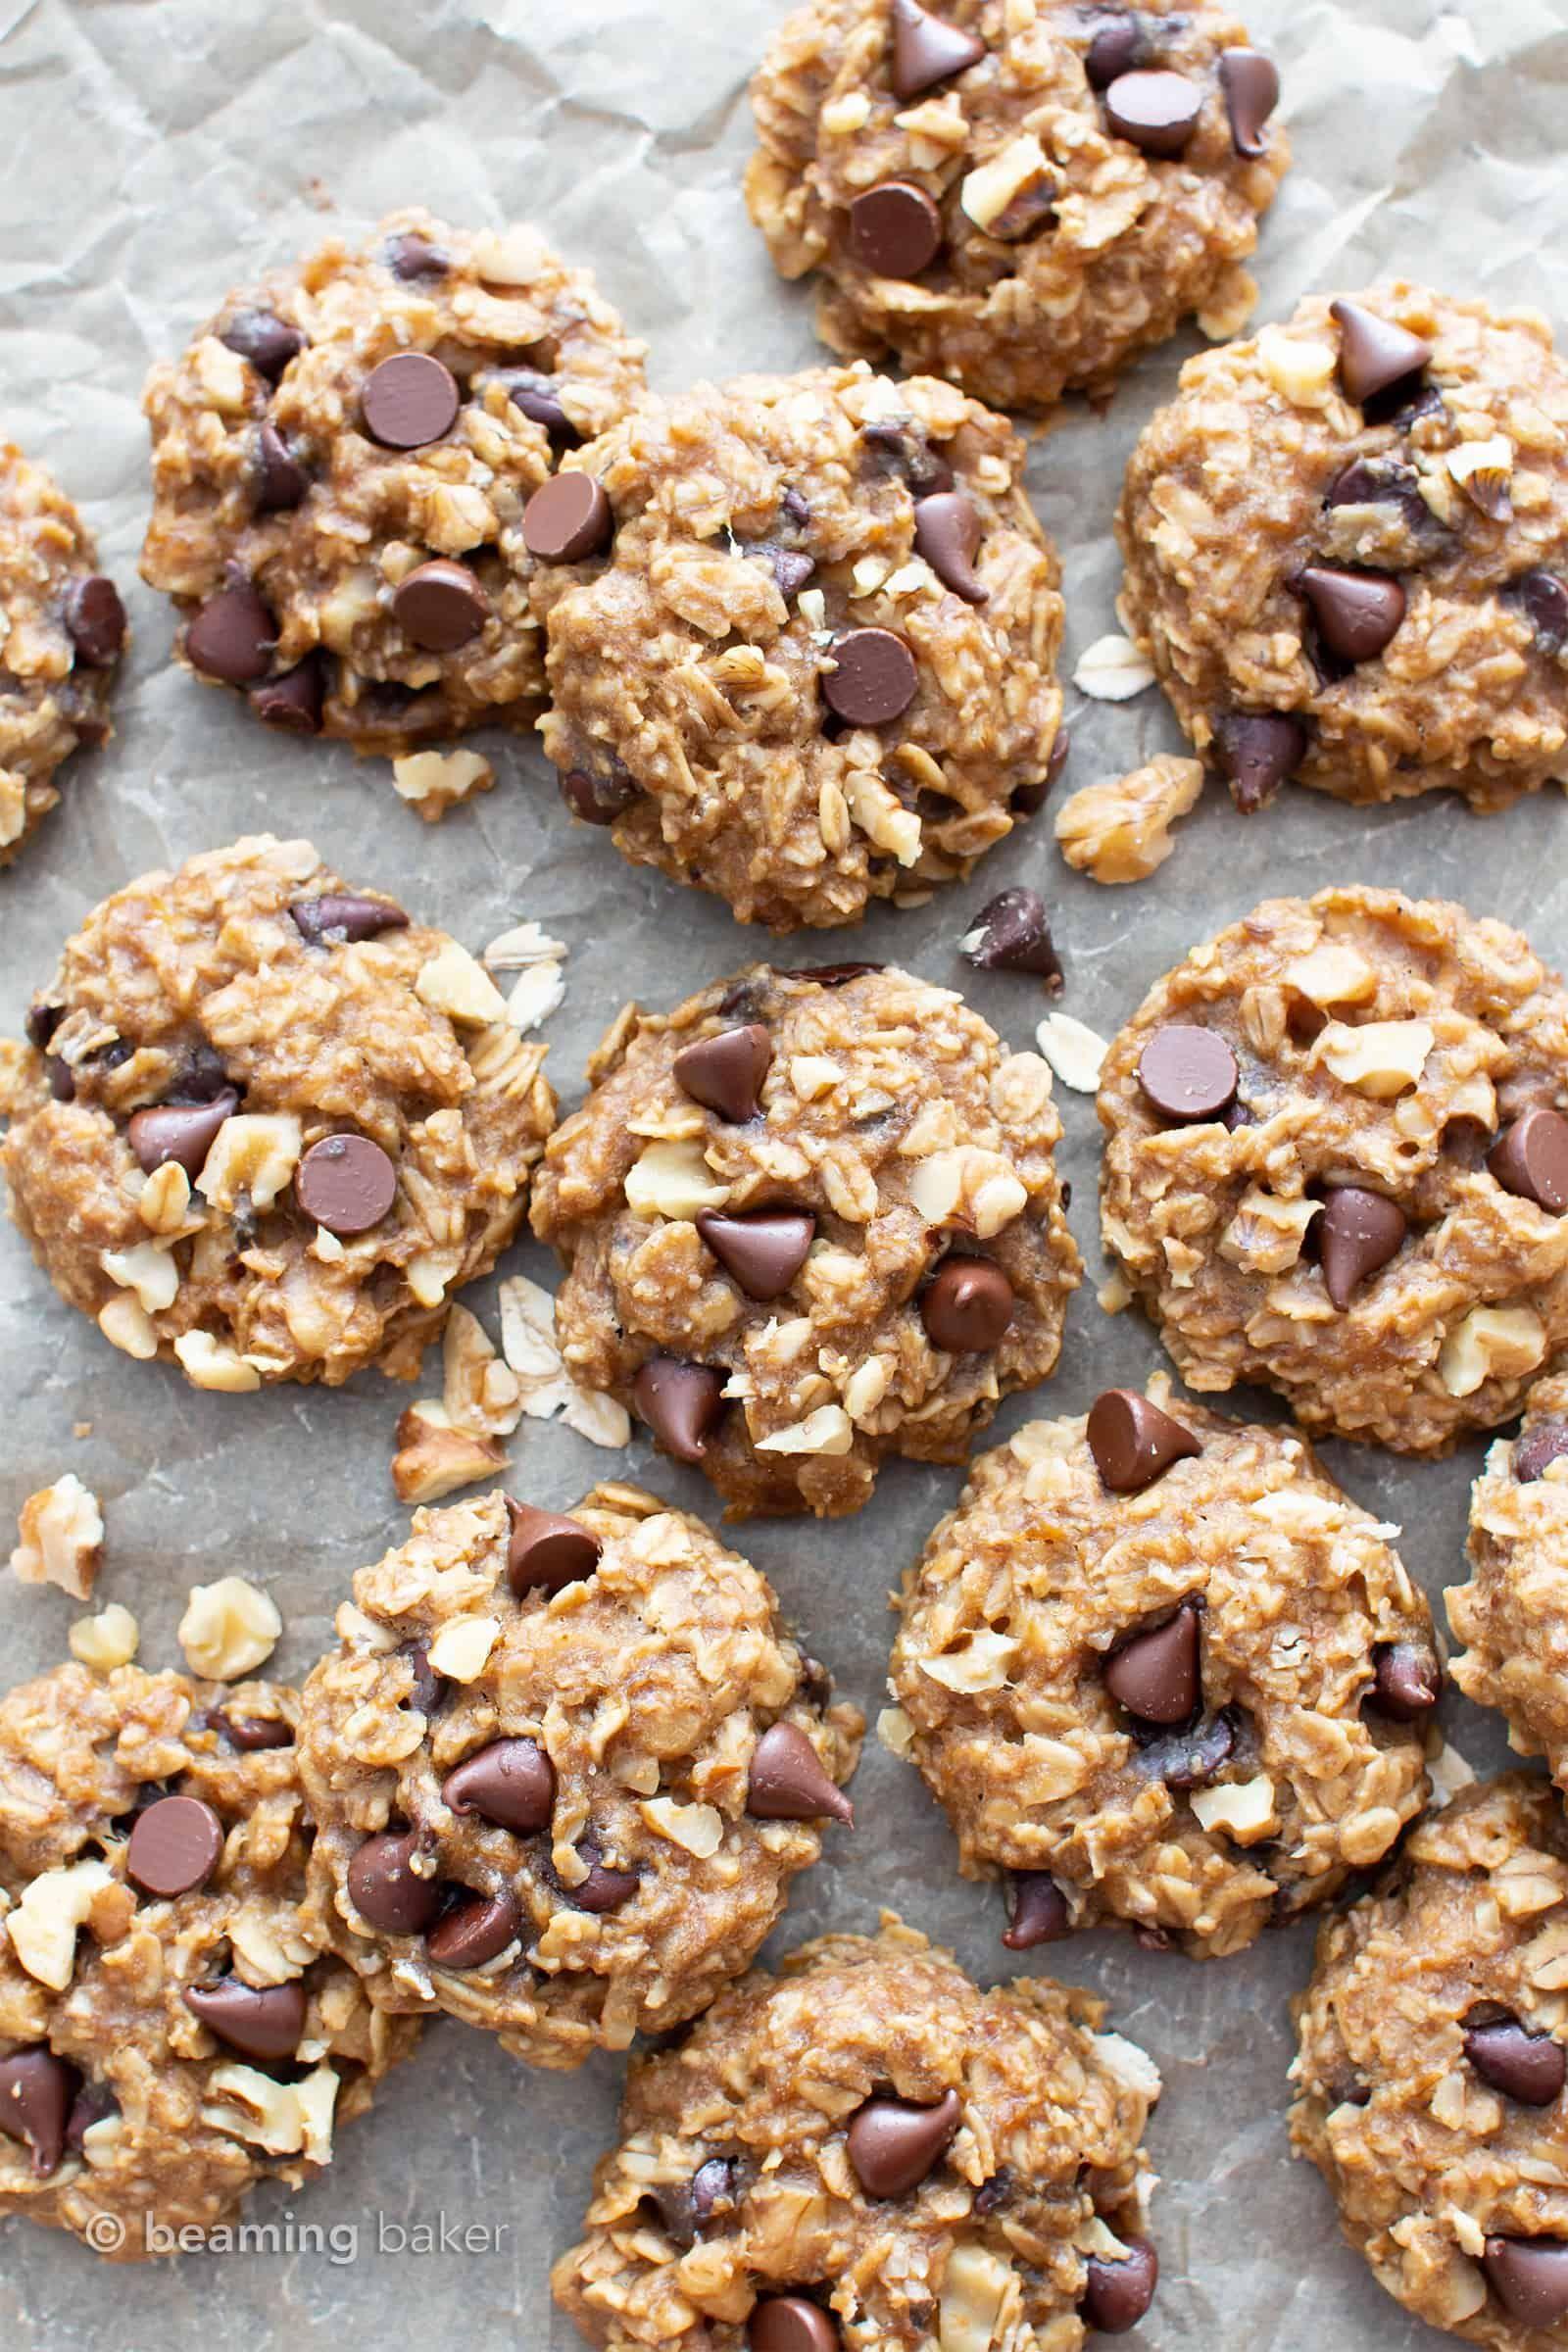 Gluten Free Chocolate Chip Banana Oatmeal Breakfast Cookies